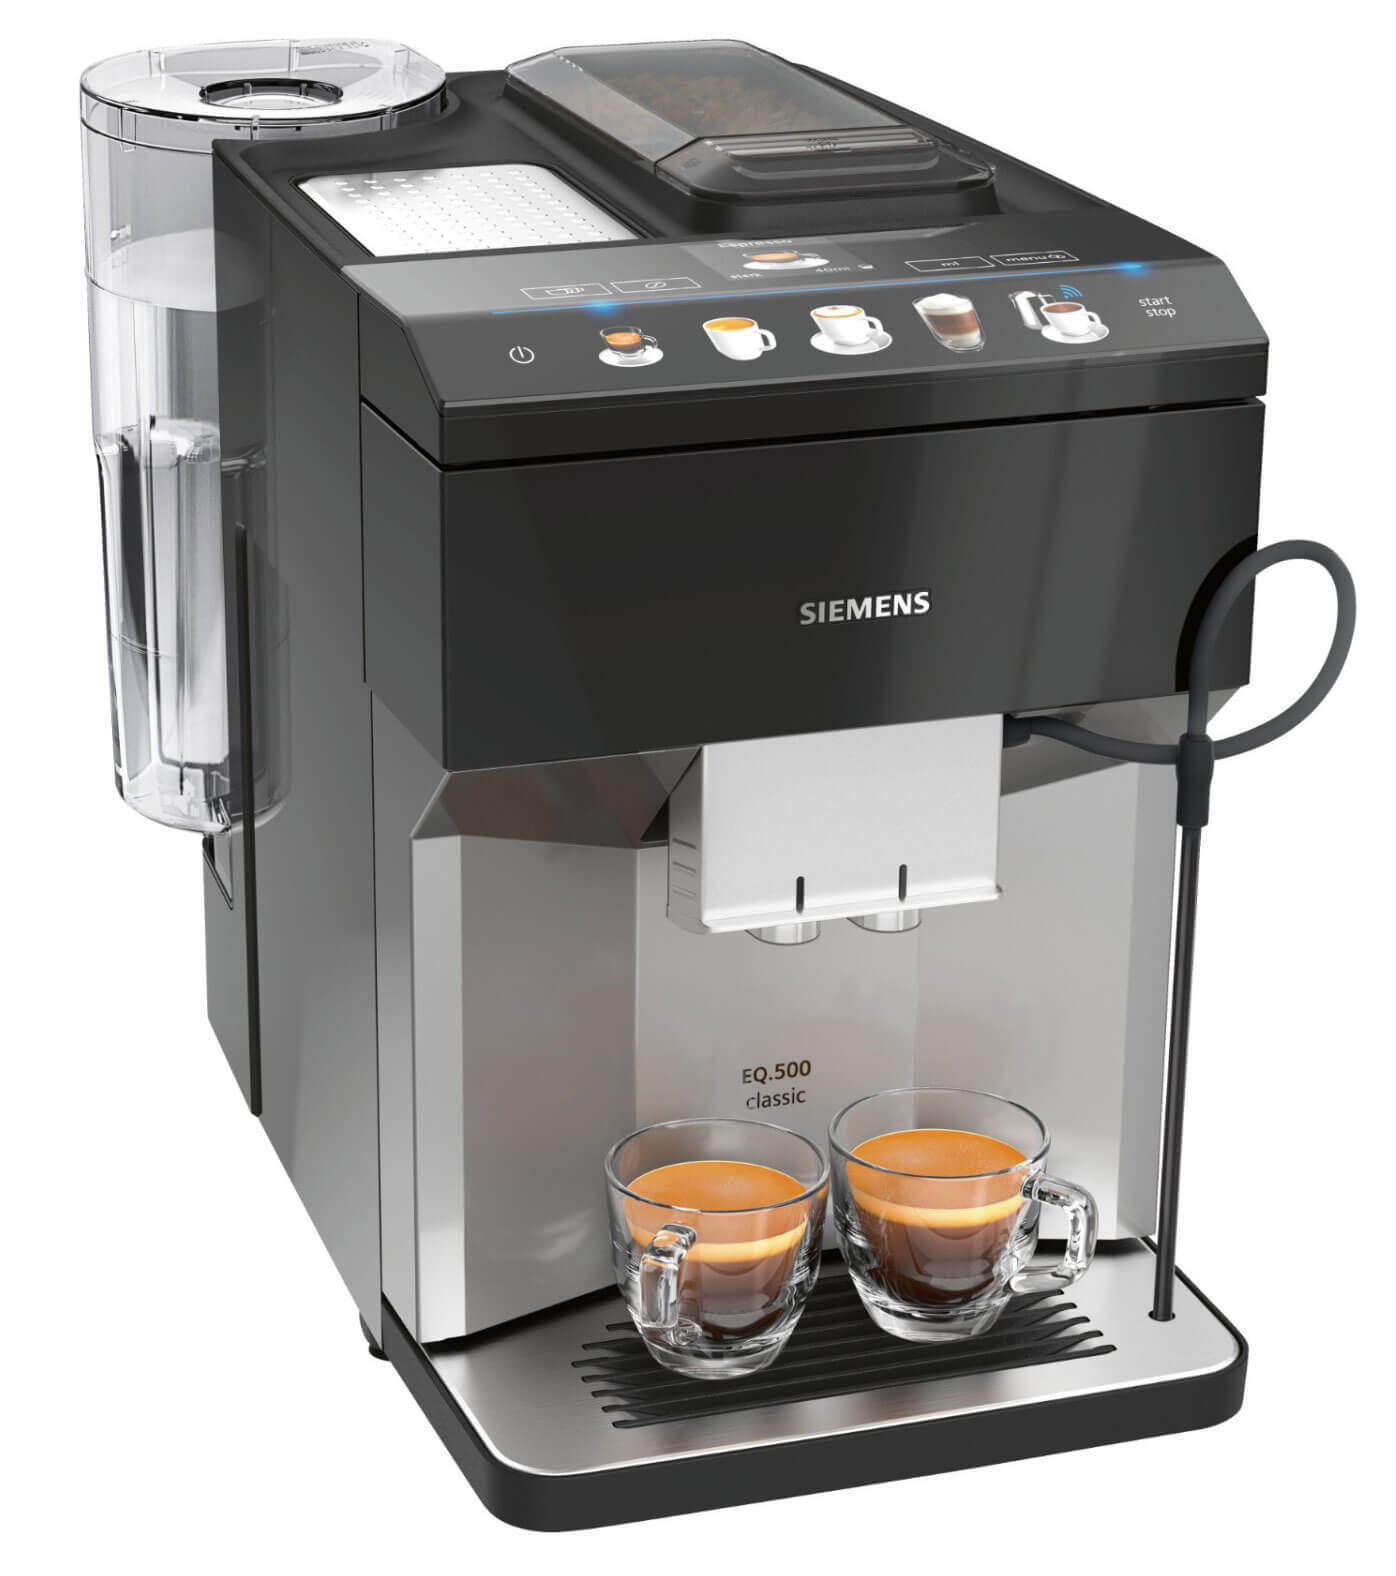 Siemens Kaffeevollautomat EQ 500 cla SSIC | Kamasega